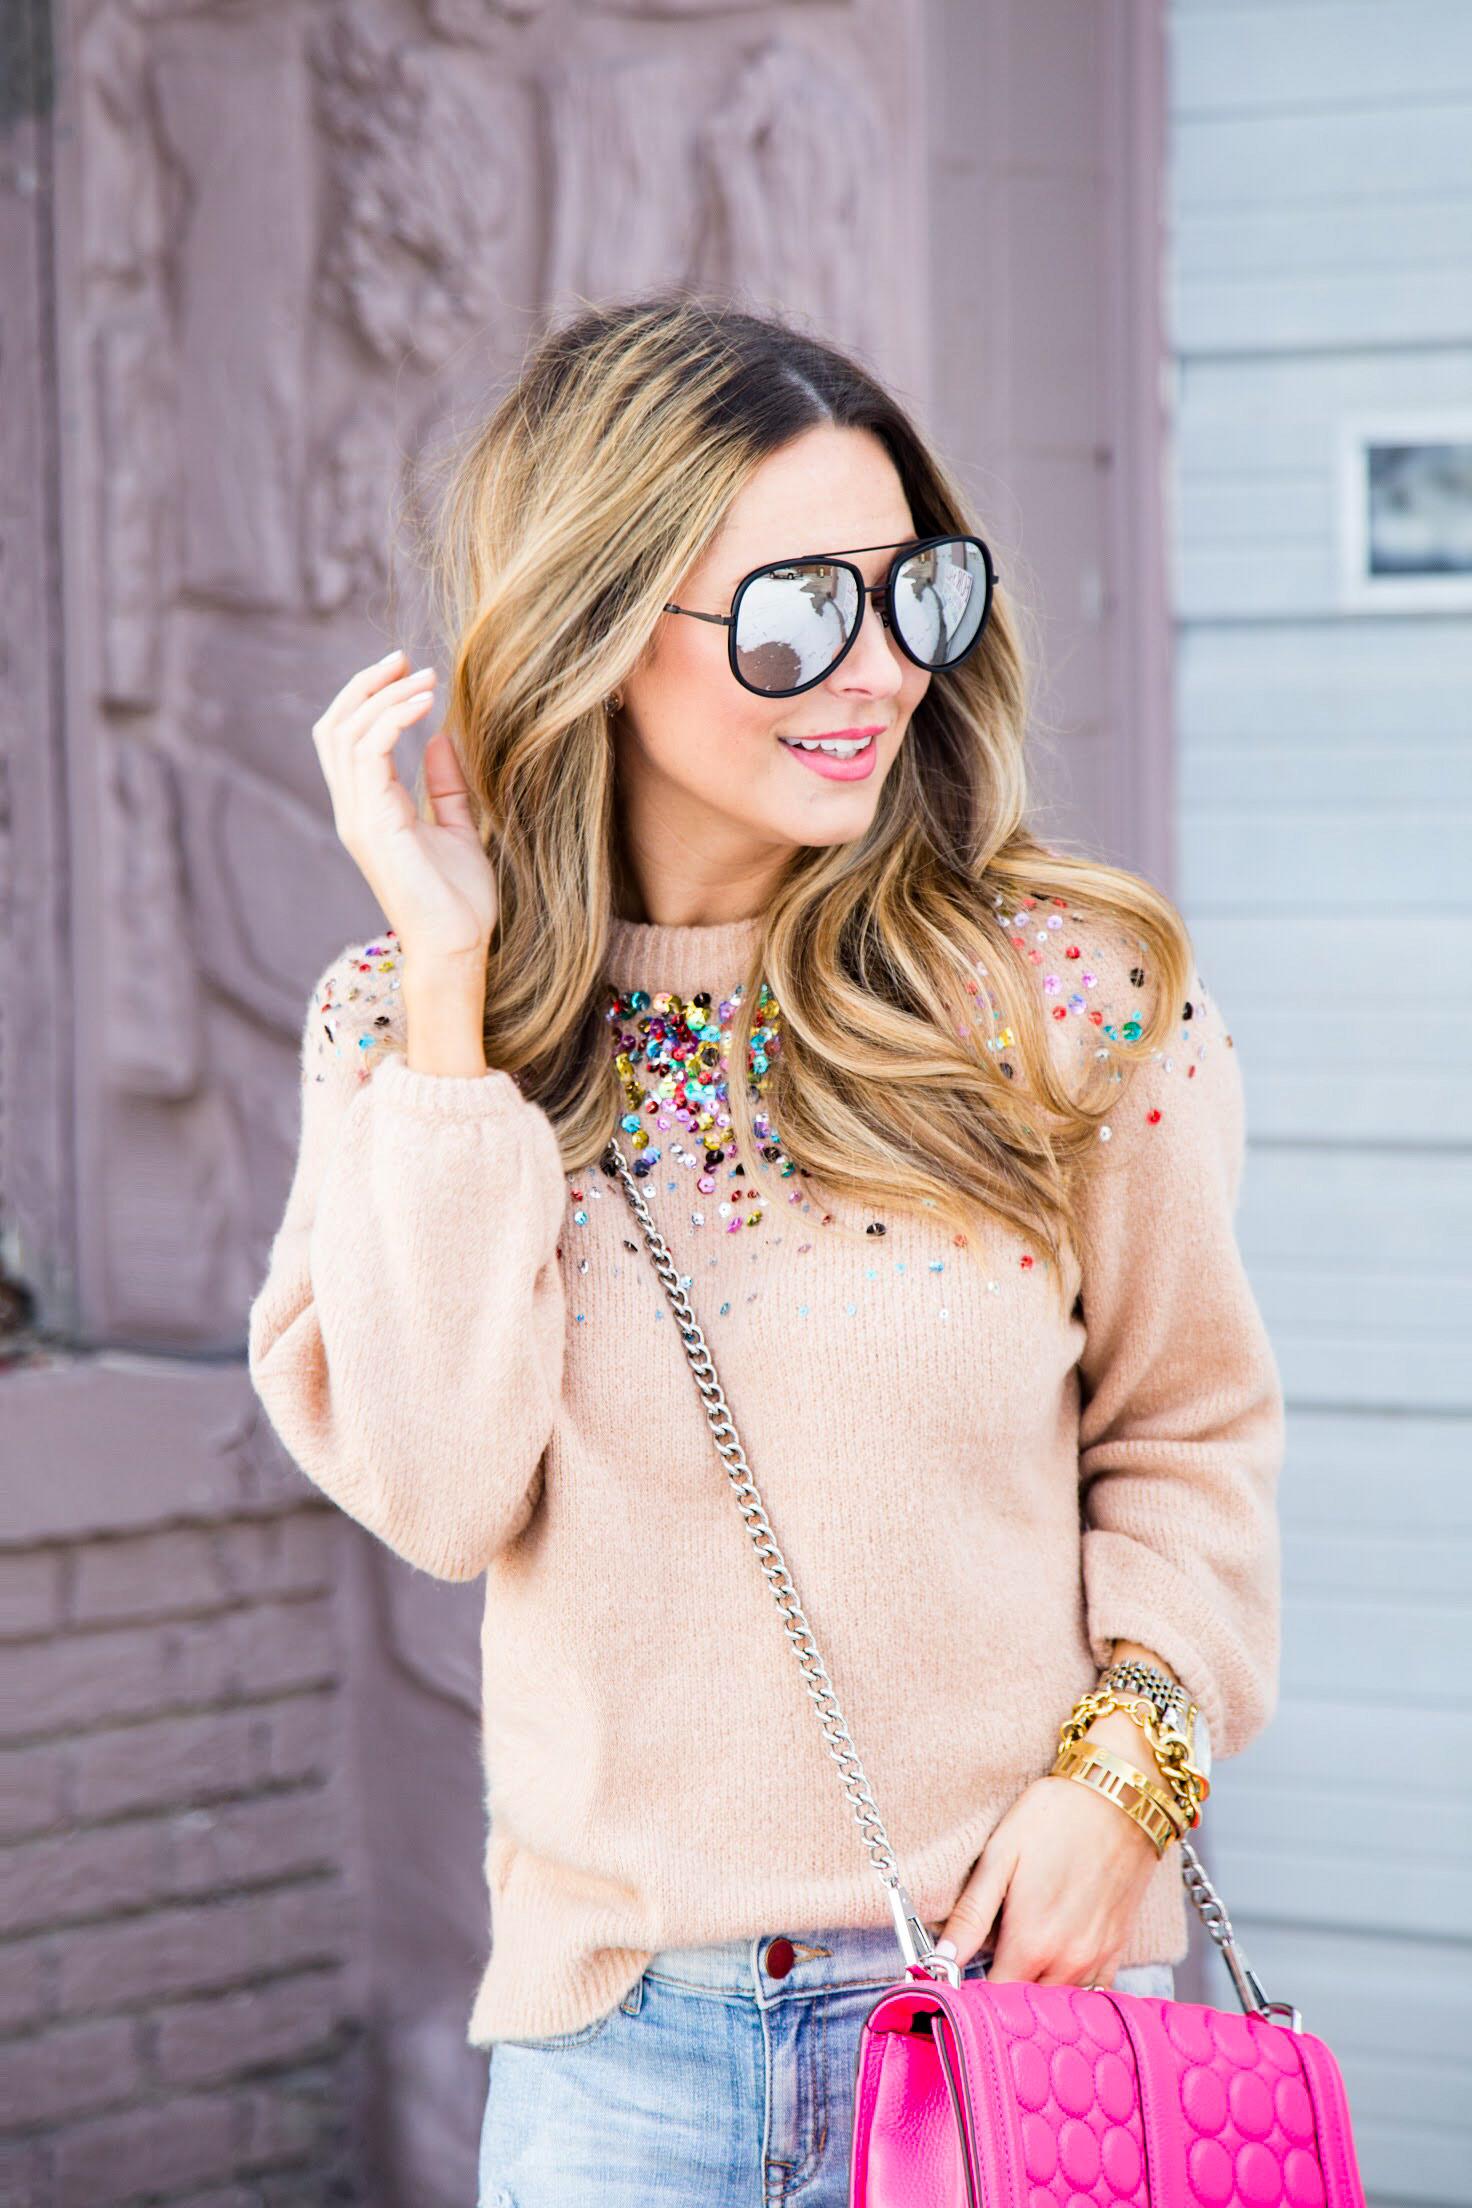 multicolored sequin sweater from SheIn, Quay sunglasses